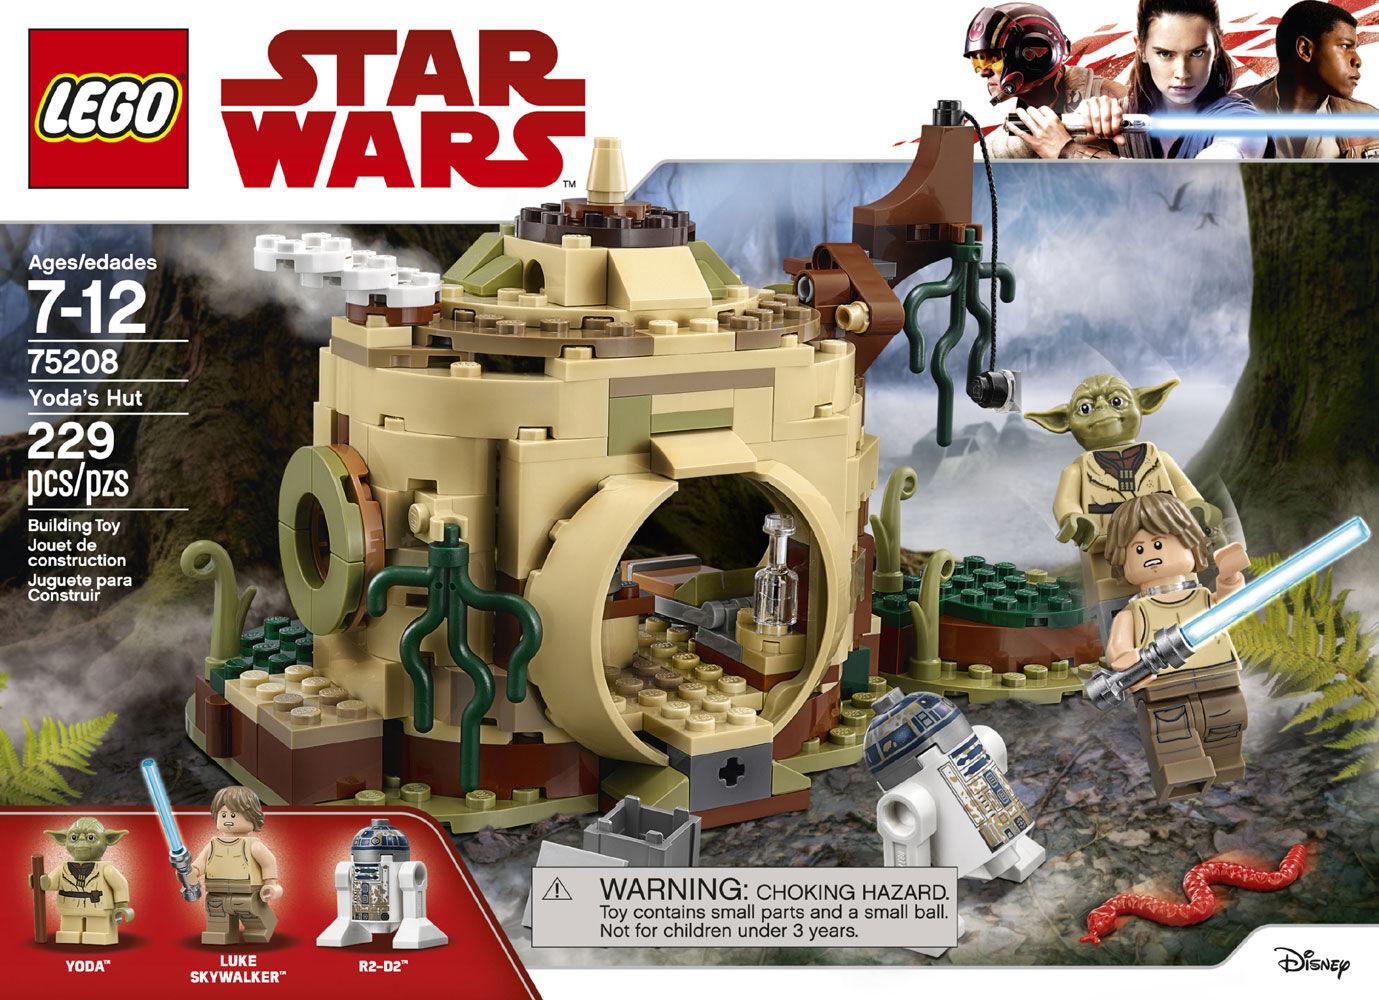 LEGO Star Wars-Jeu de Construction-La hutte de Yoda 75208